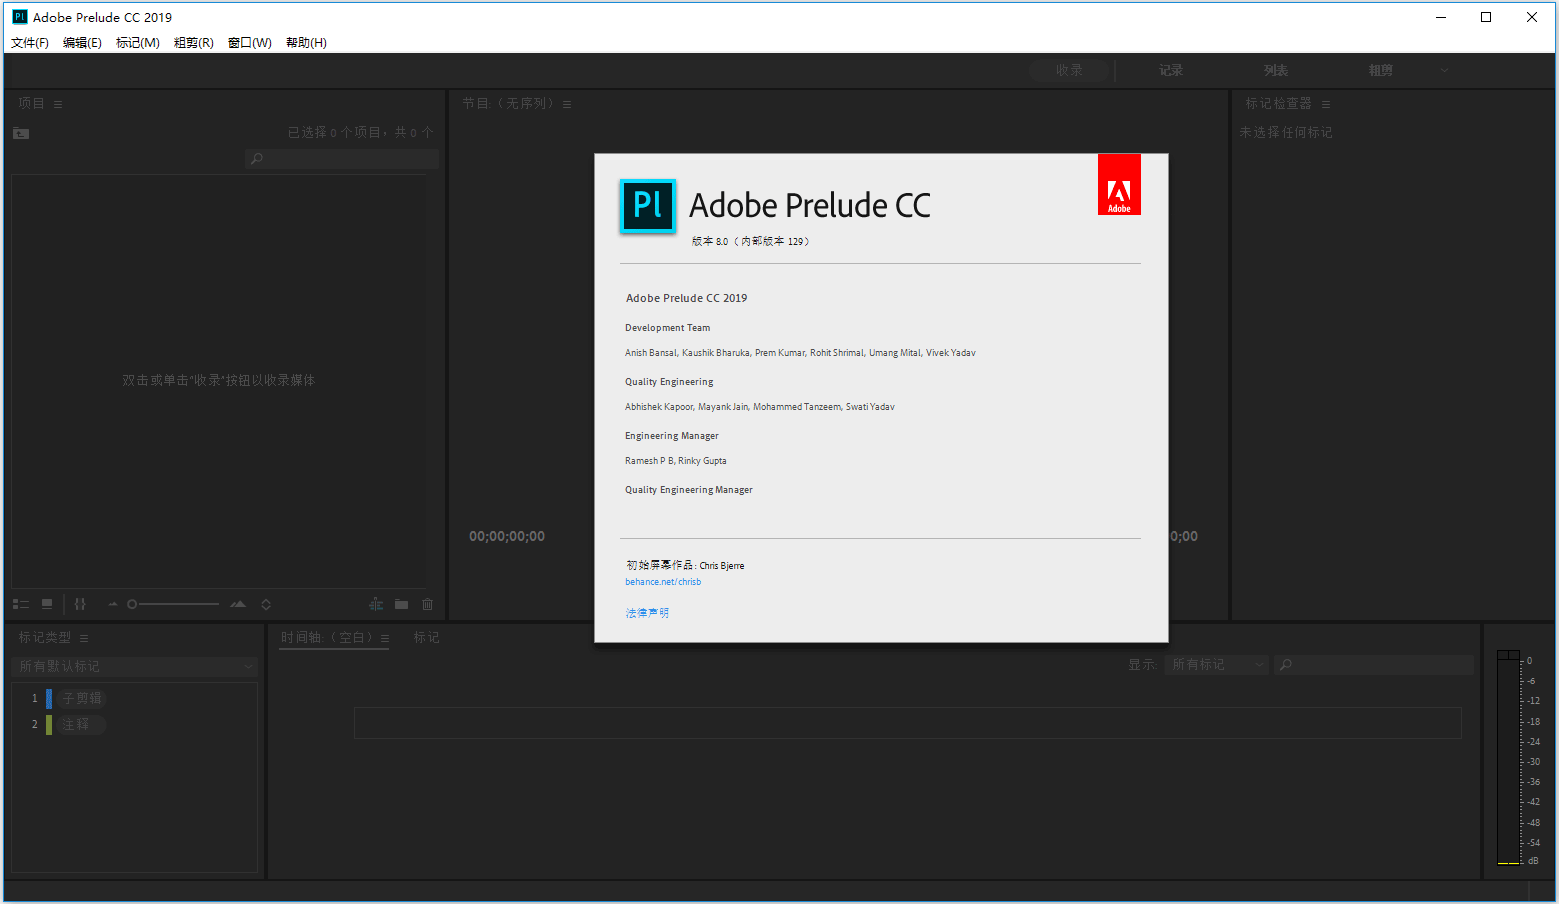 Adobe Prelude CC 2019中文免费版截图0